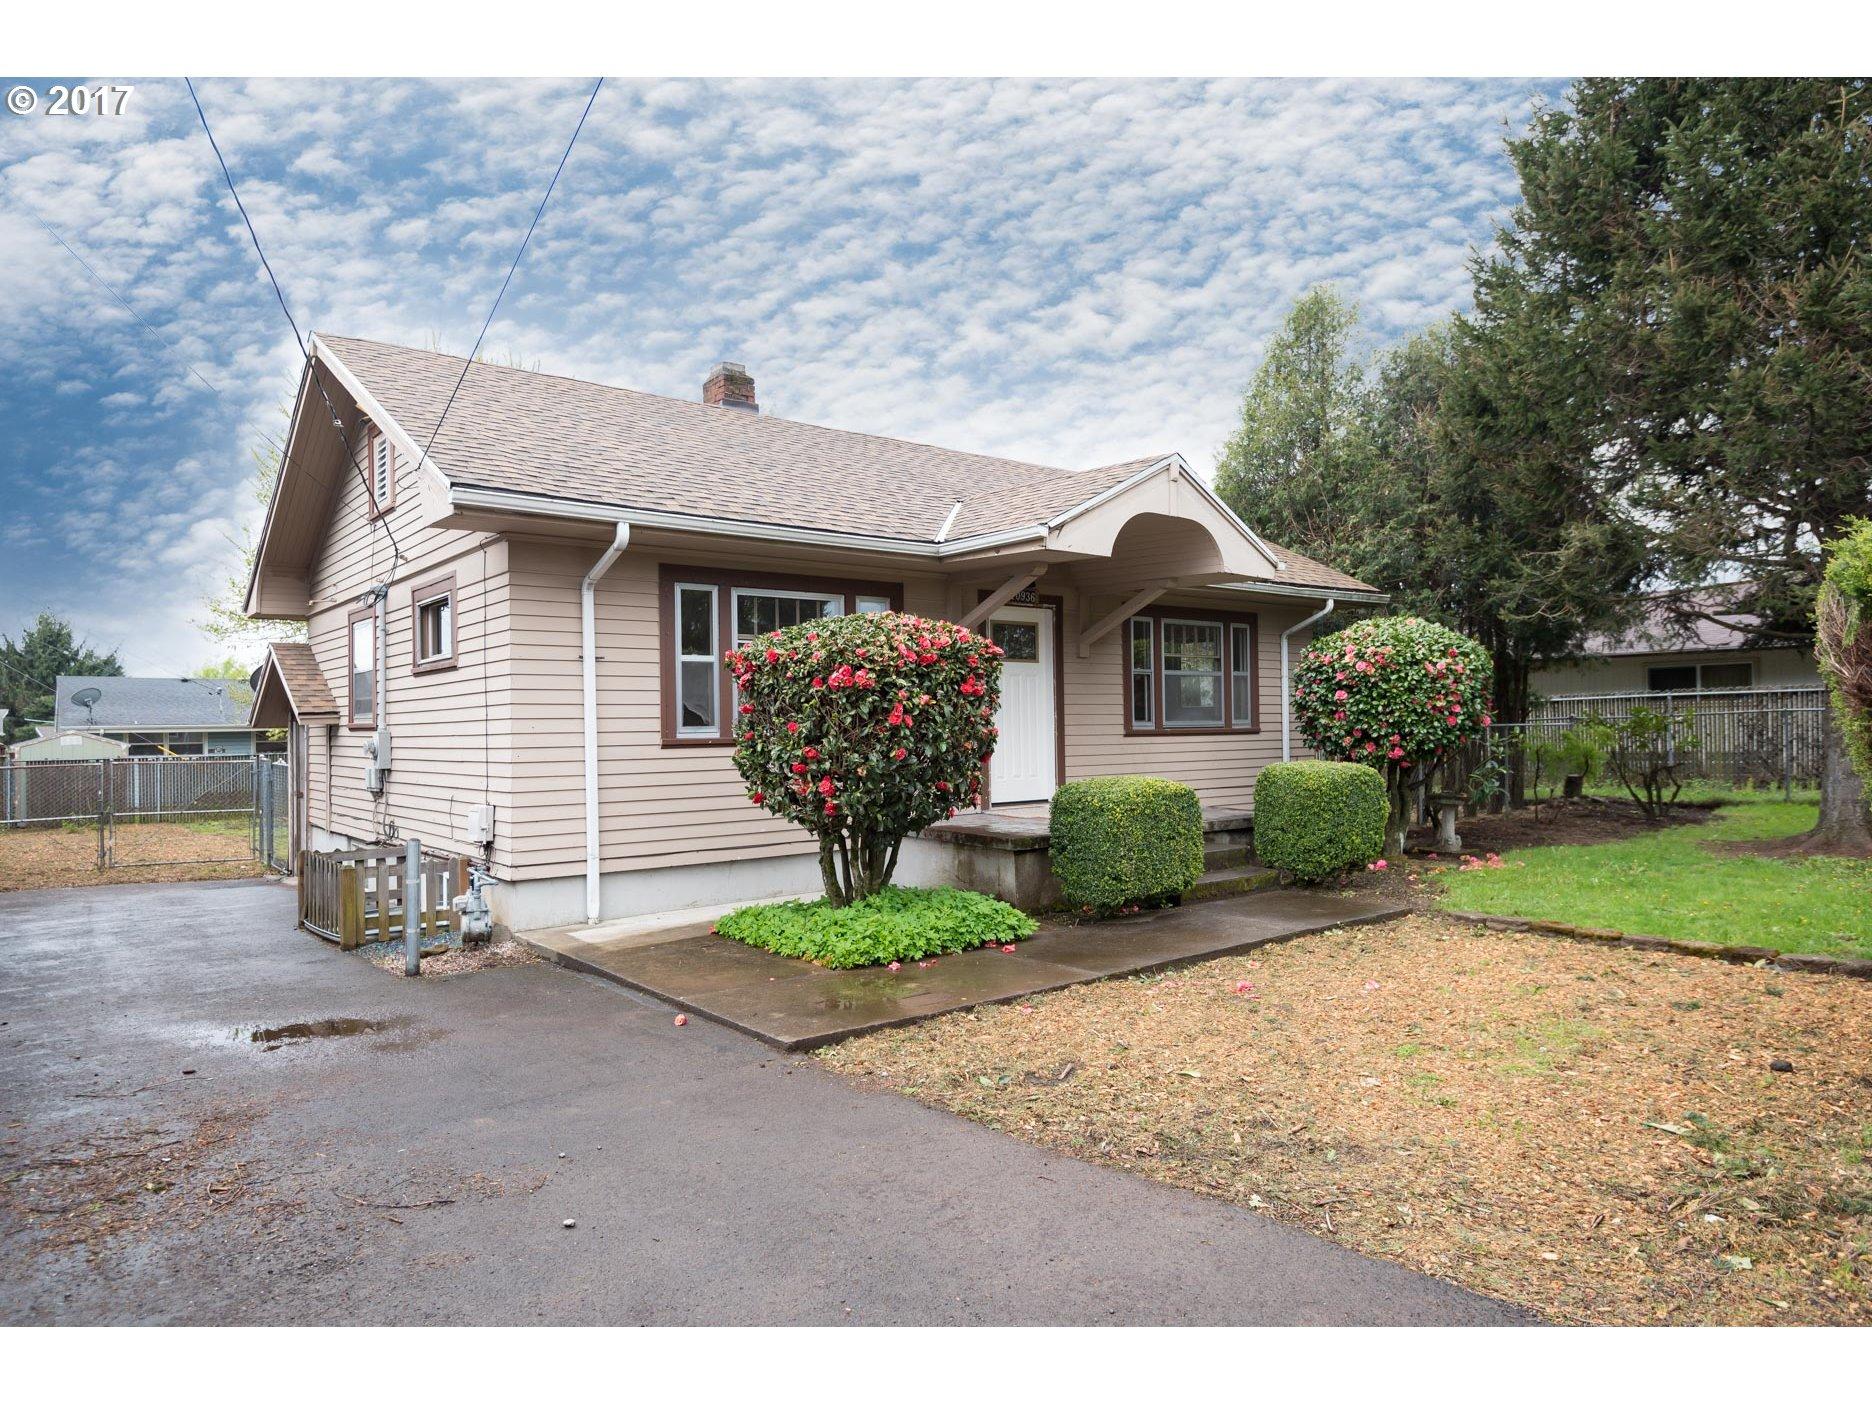 10936 NE GLISAN ST, Portland, OR 97220